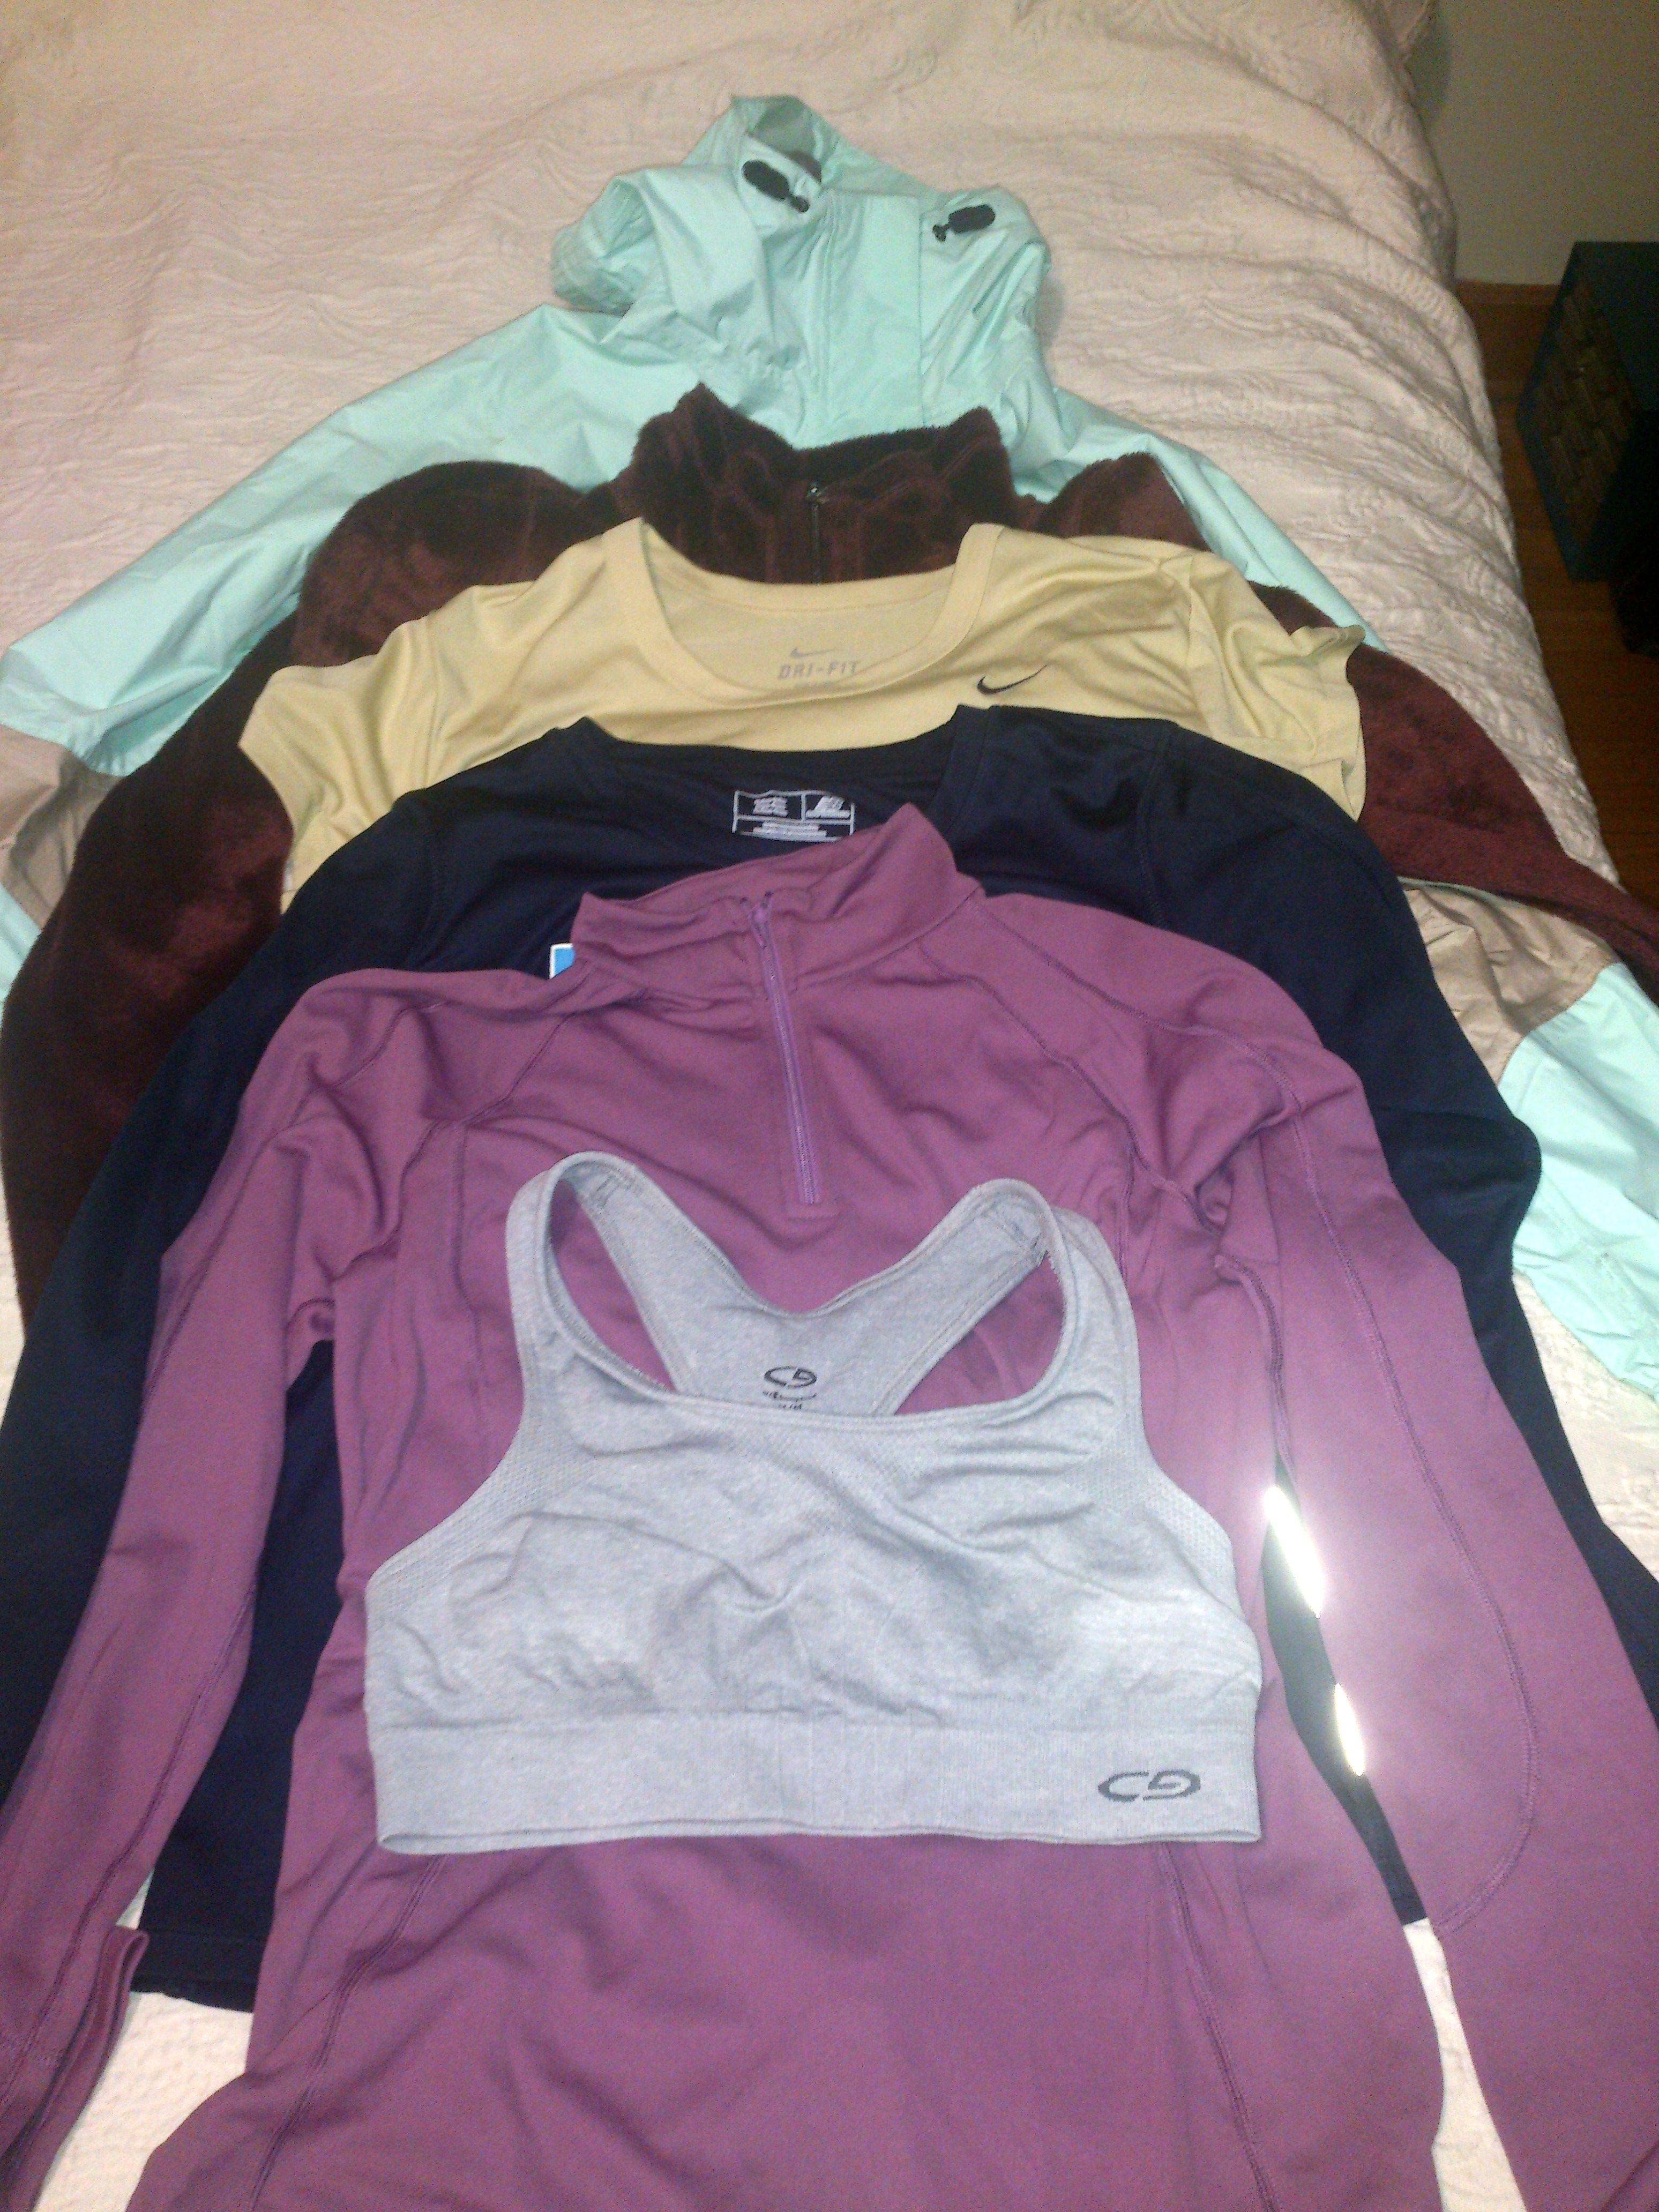 Mariposa thru-hiking clothes